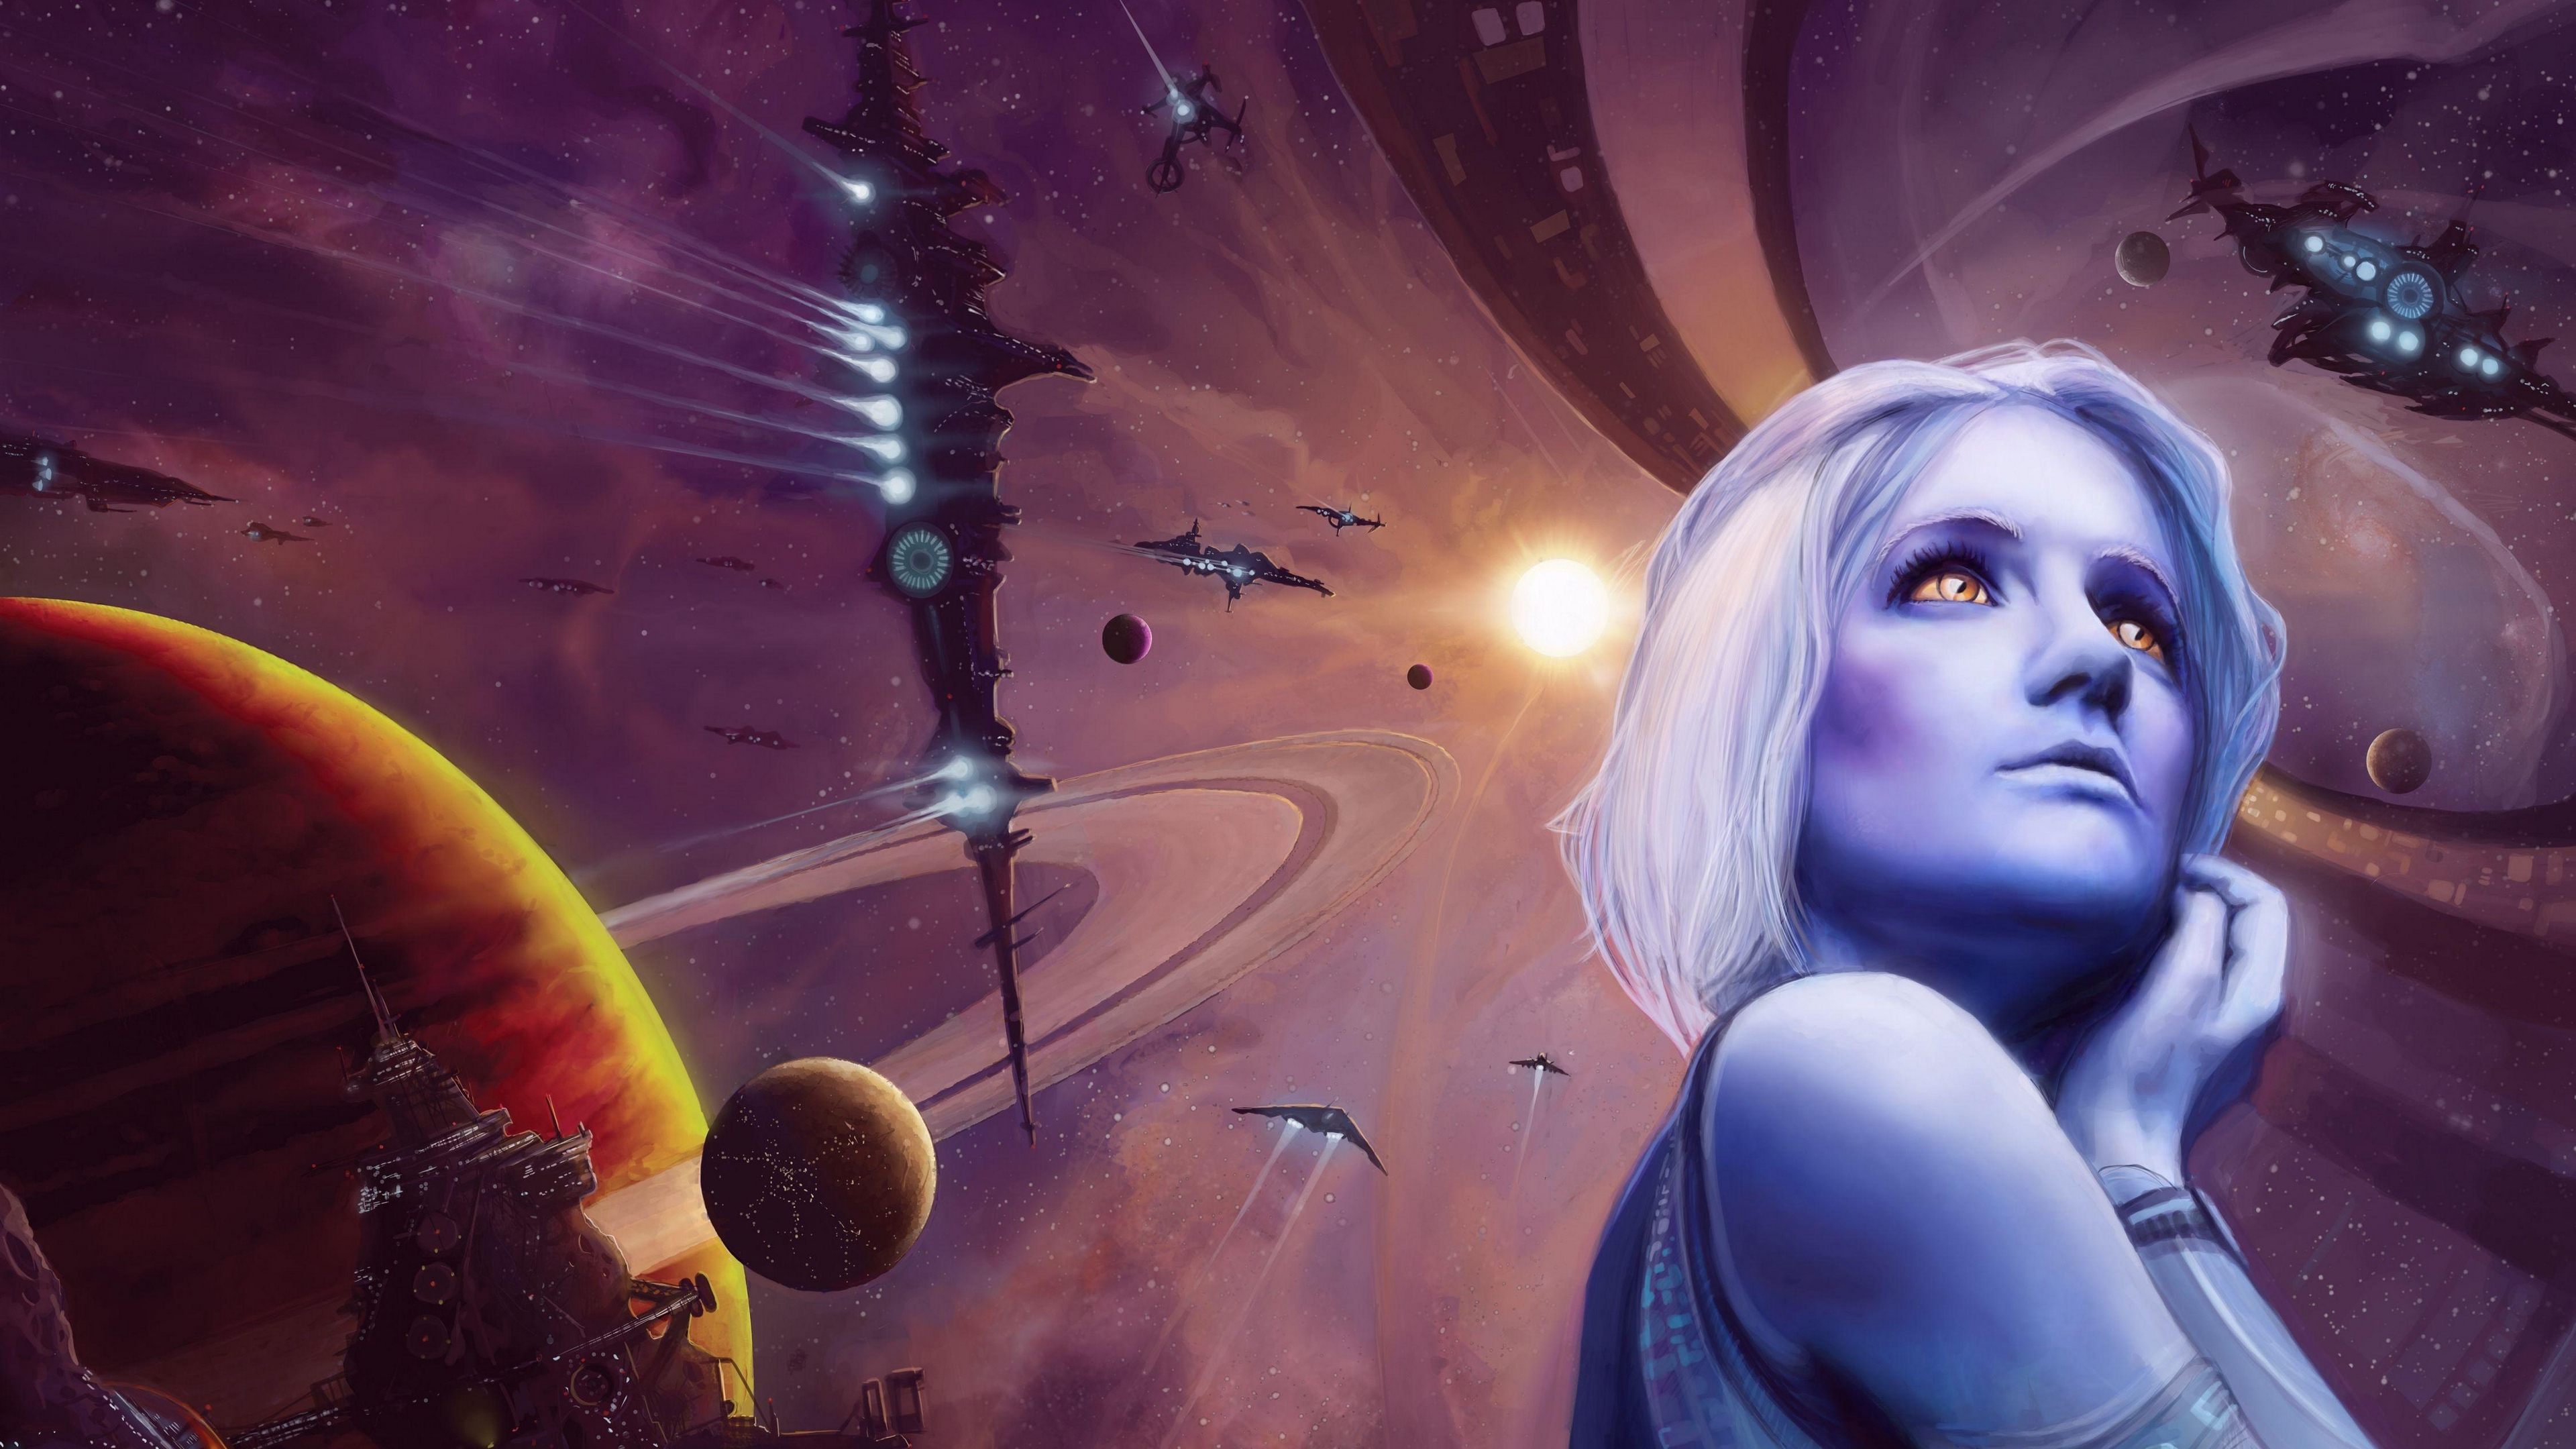 girl space spaceship planet 4k 1536098087 - girl, space, spaceship, planet 4k - Spaceship, Space, Girl